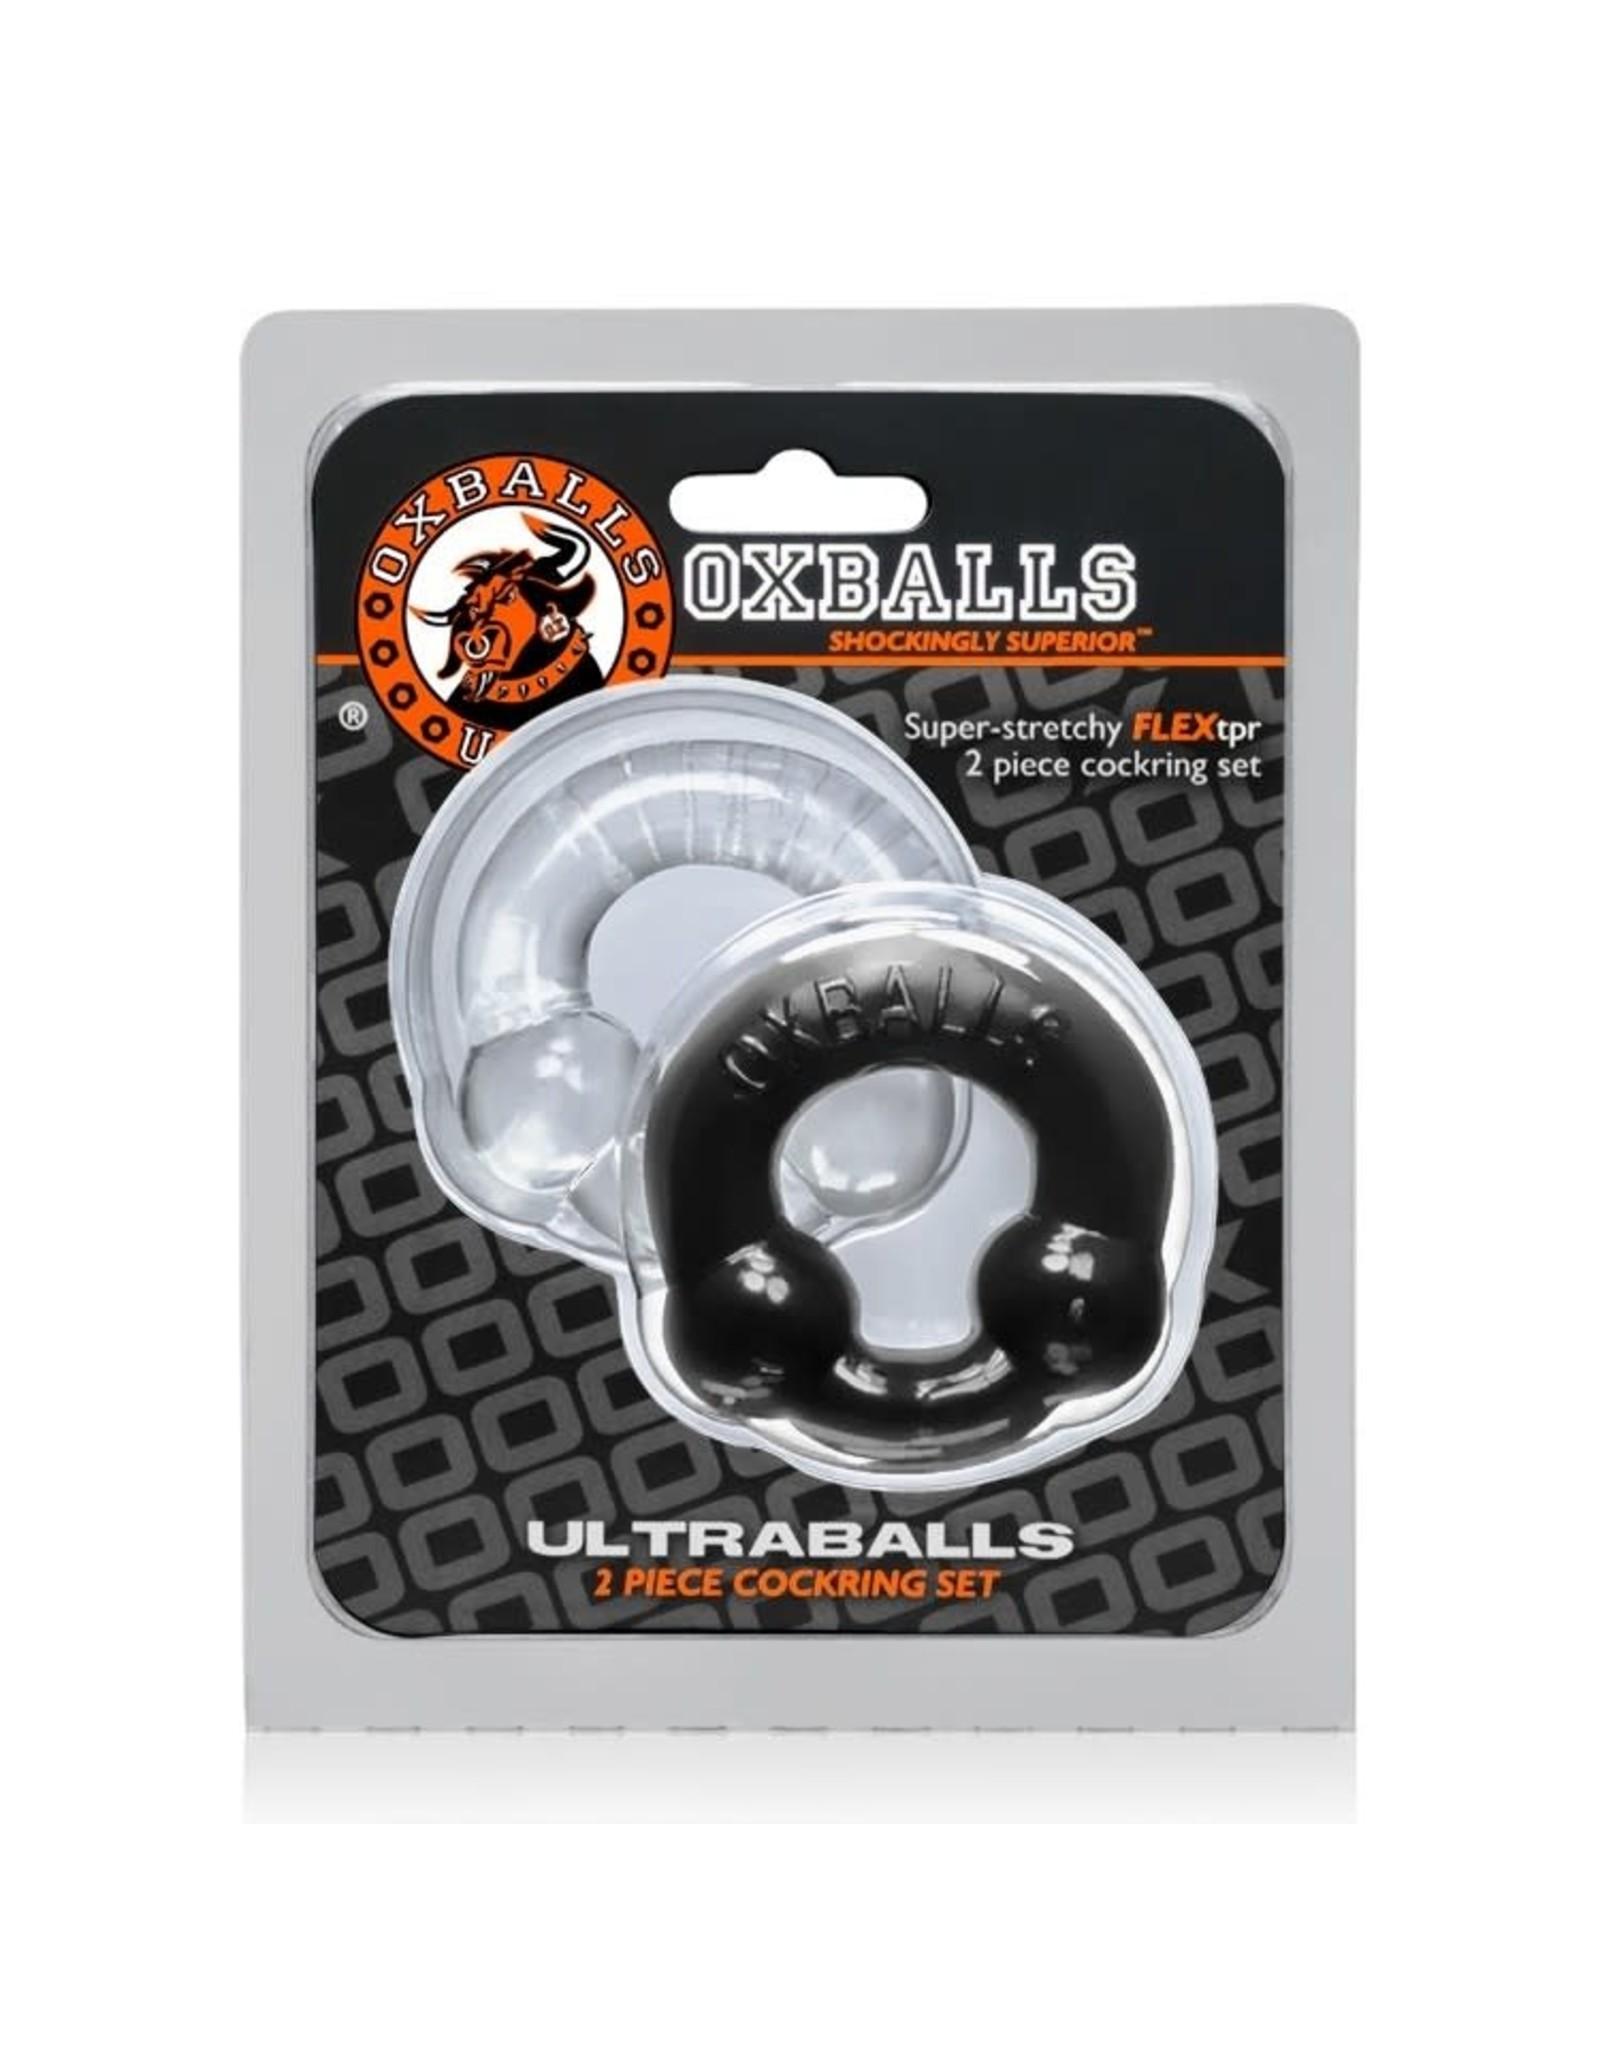 Oxballs OxBalls Ultra Balls Cockring 2-pack